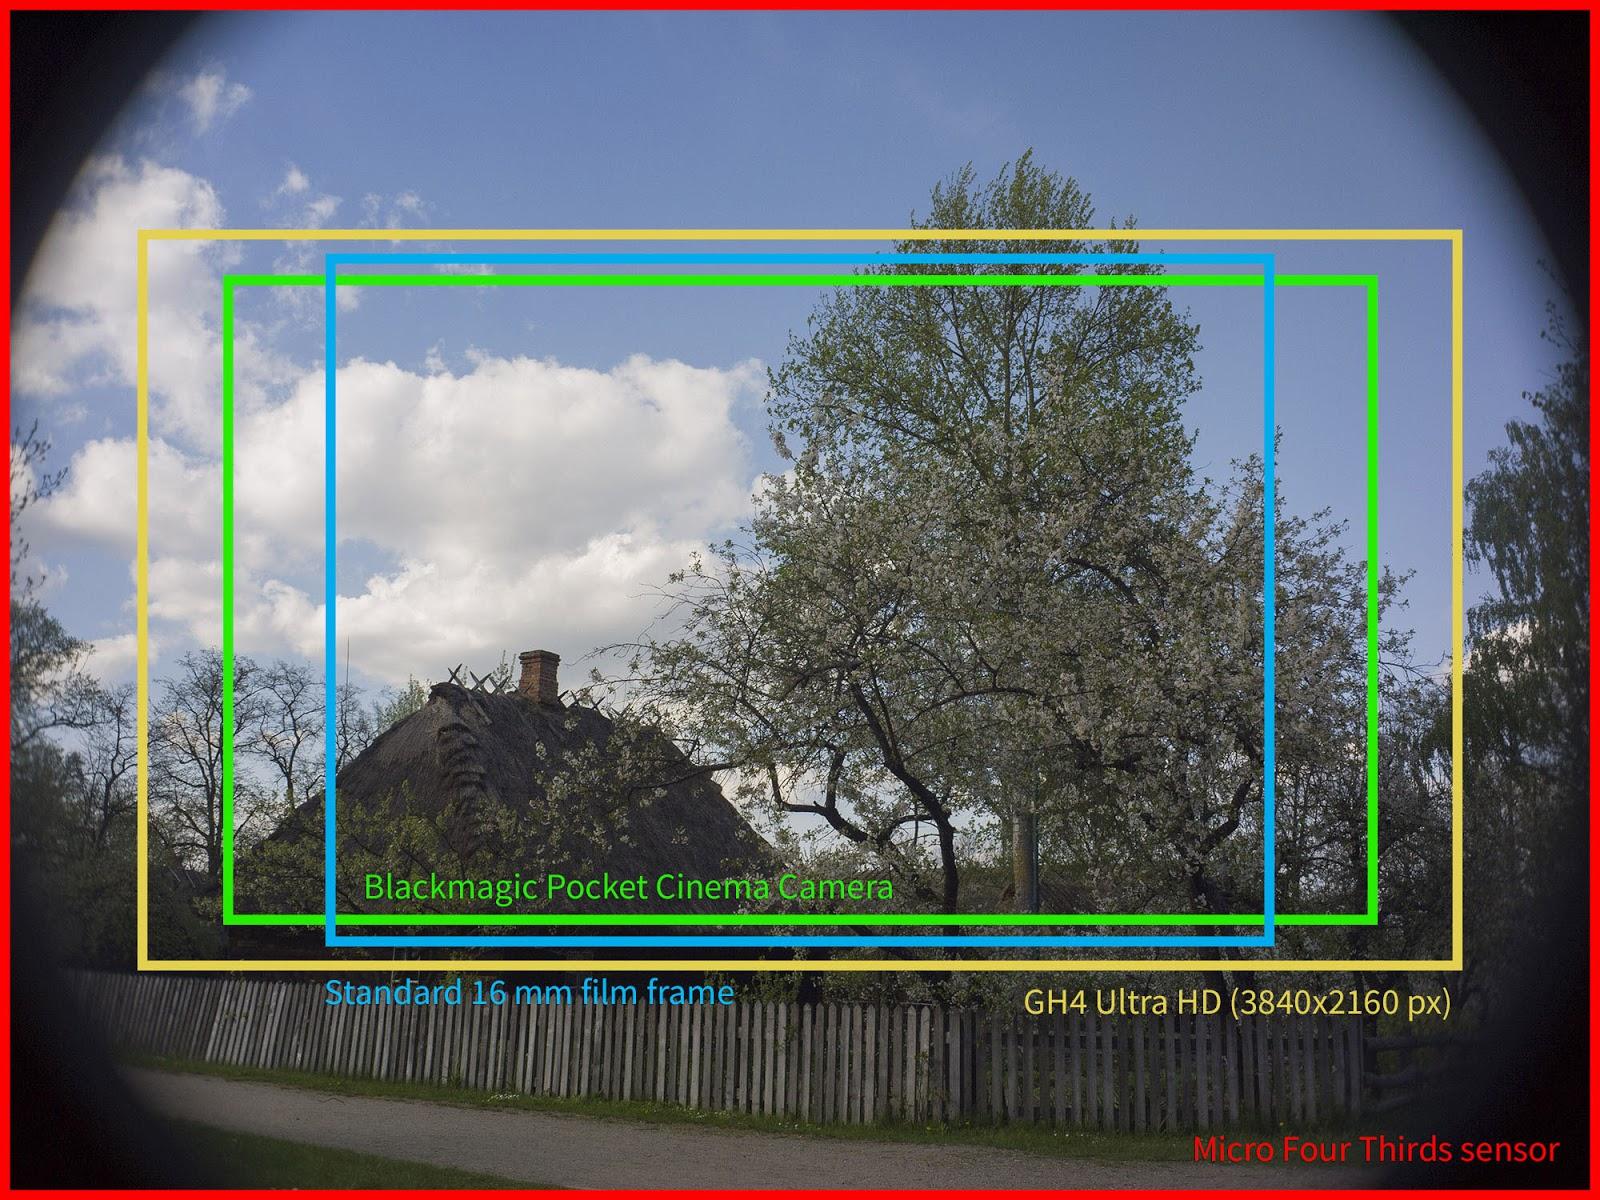 Tevidon 16/1.8 @8 - MFT, BMPCC, GH4 UltraHD sensor coverage.